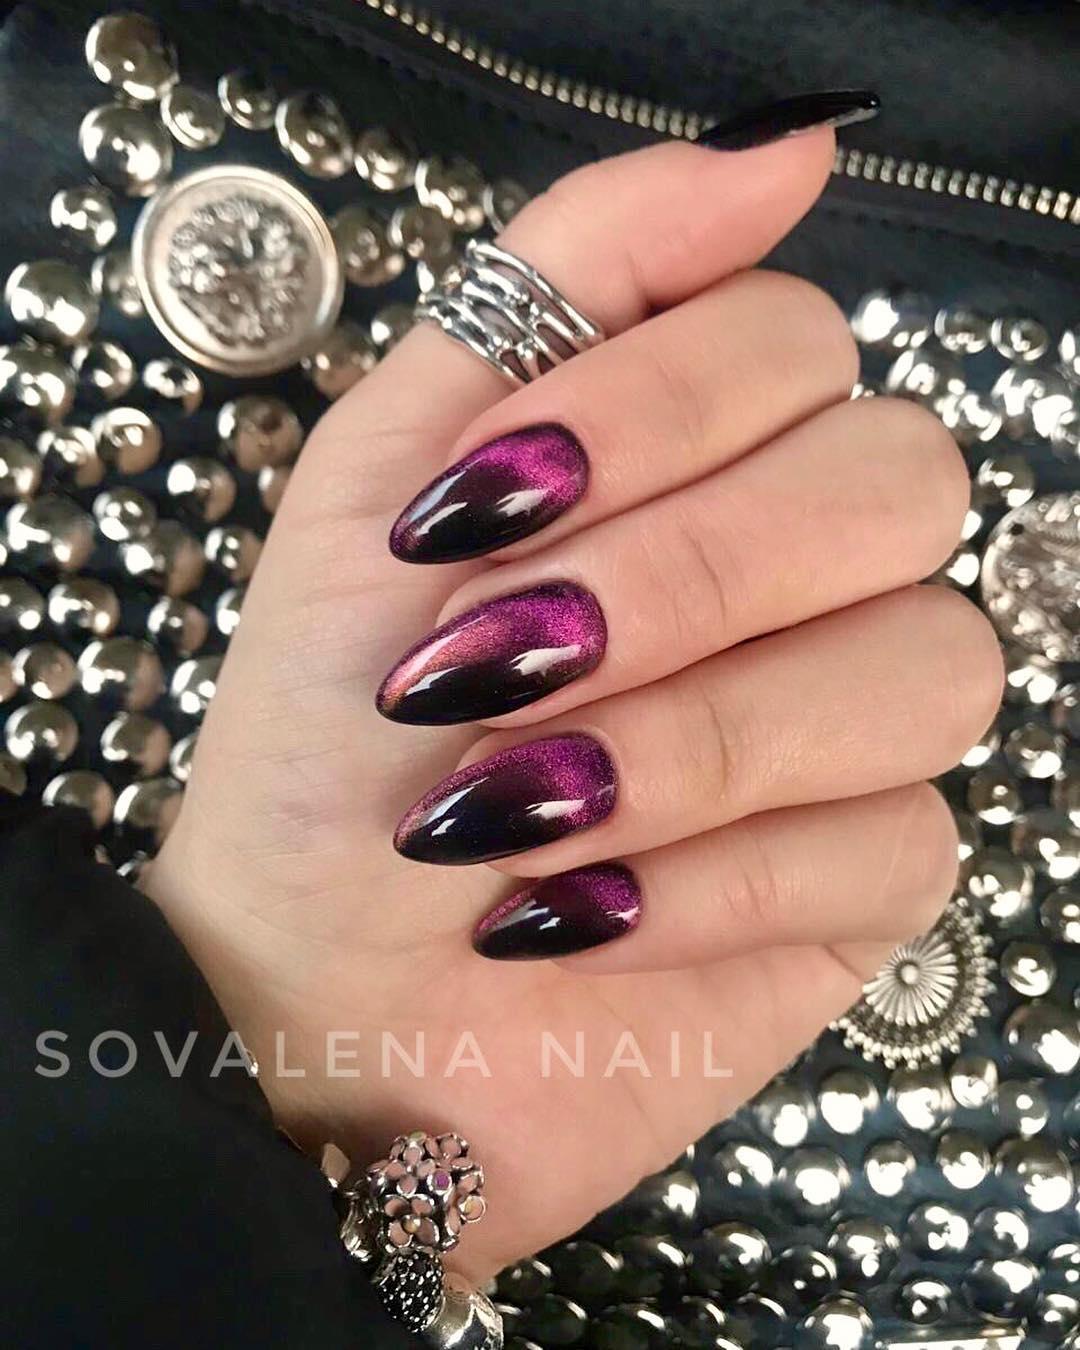 sovalena_nail_50703210_210735849796602_2144392264911370055_n